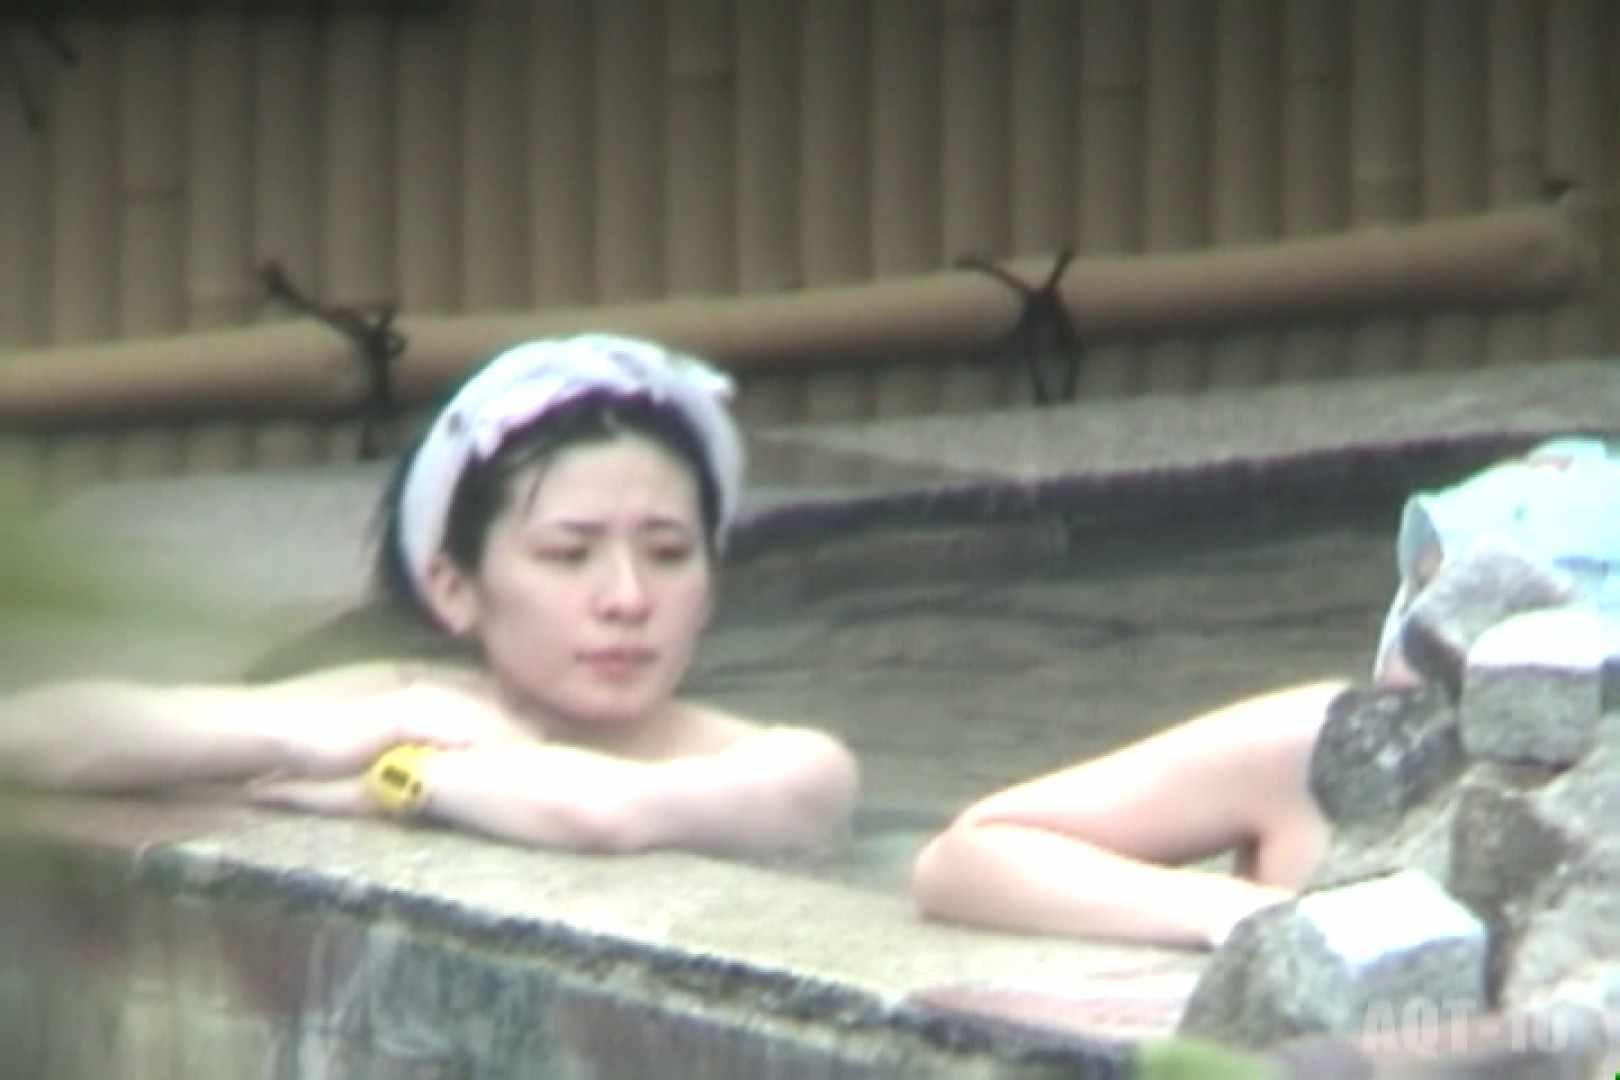 Aquaな露天風呂Vol.793 盗撮映像  72Pix 28